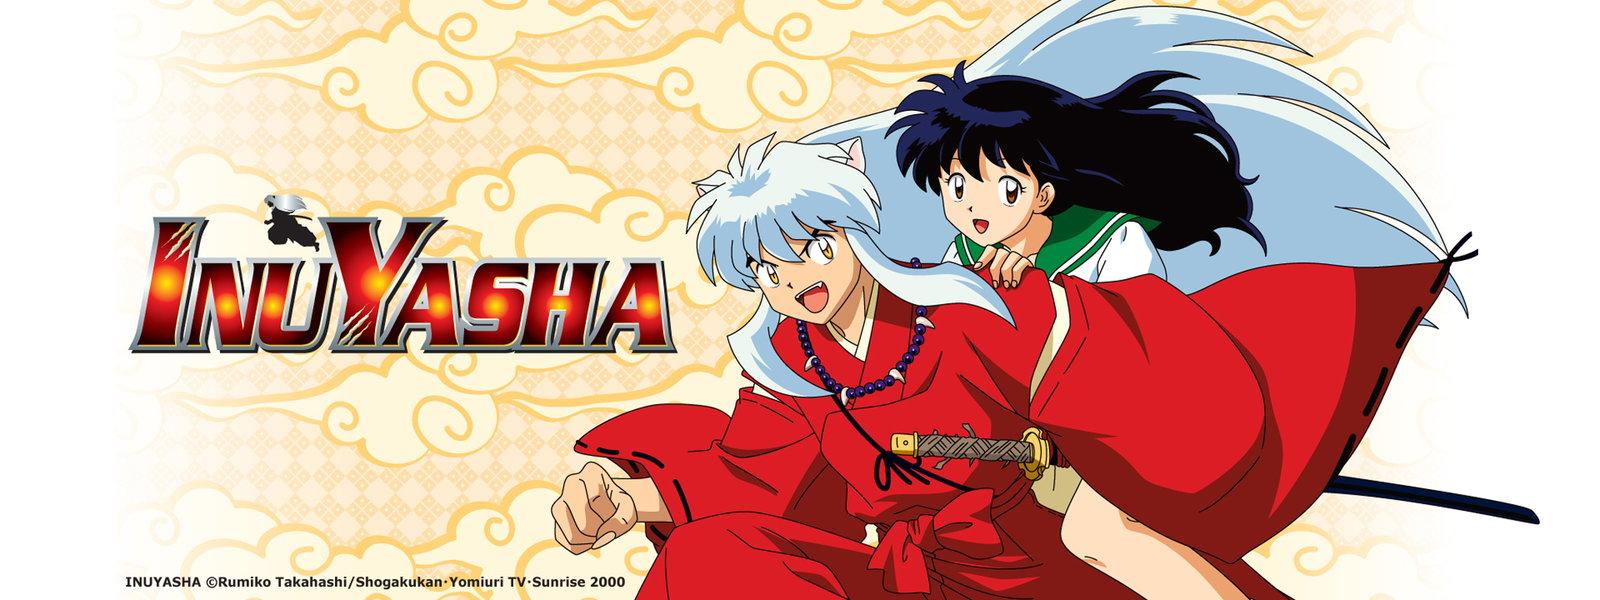 Favorite Anime